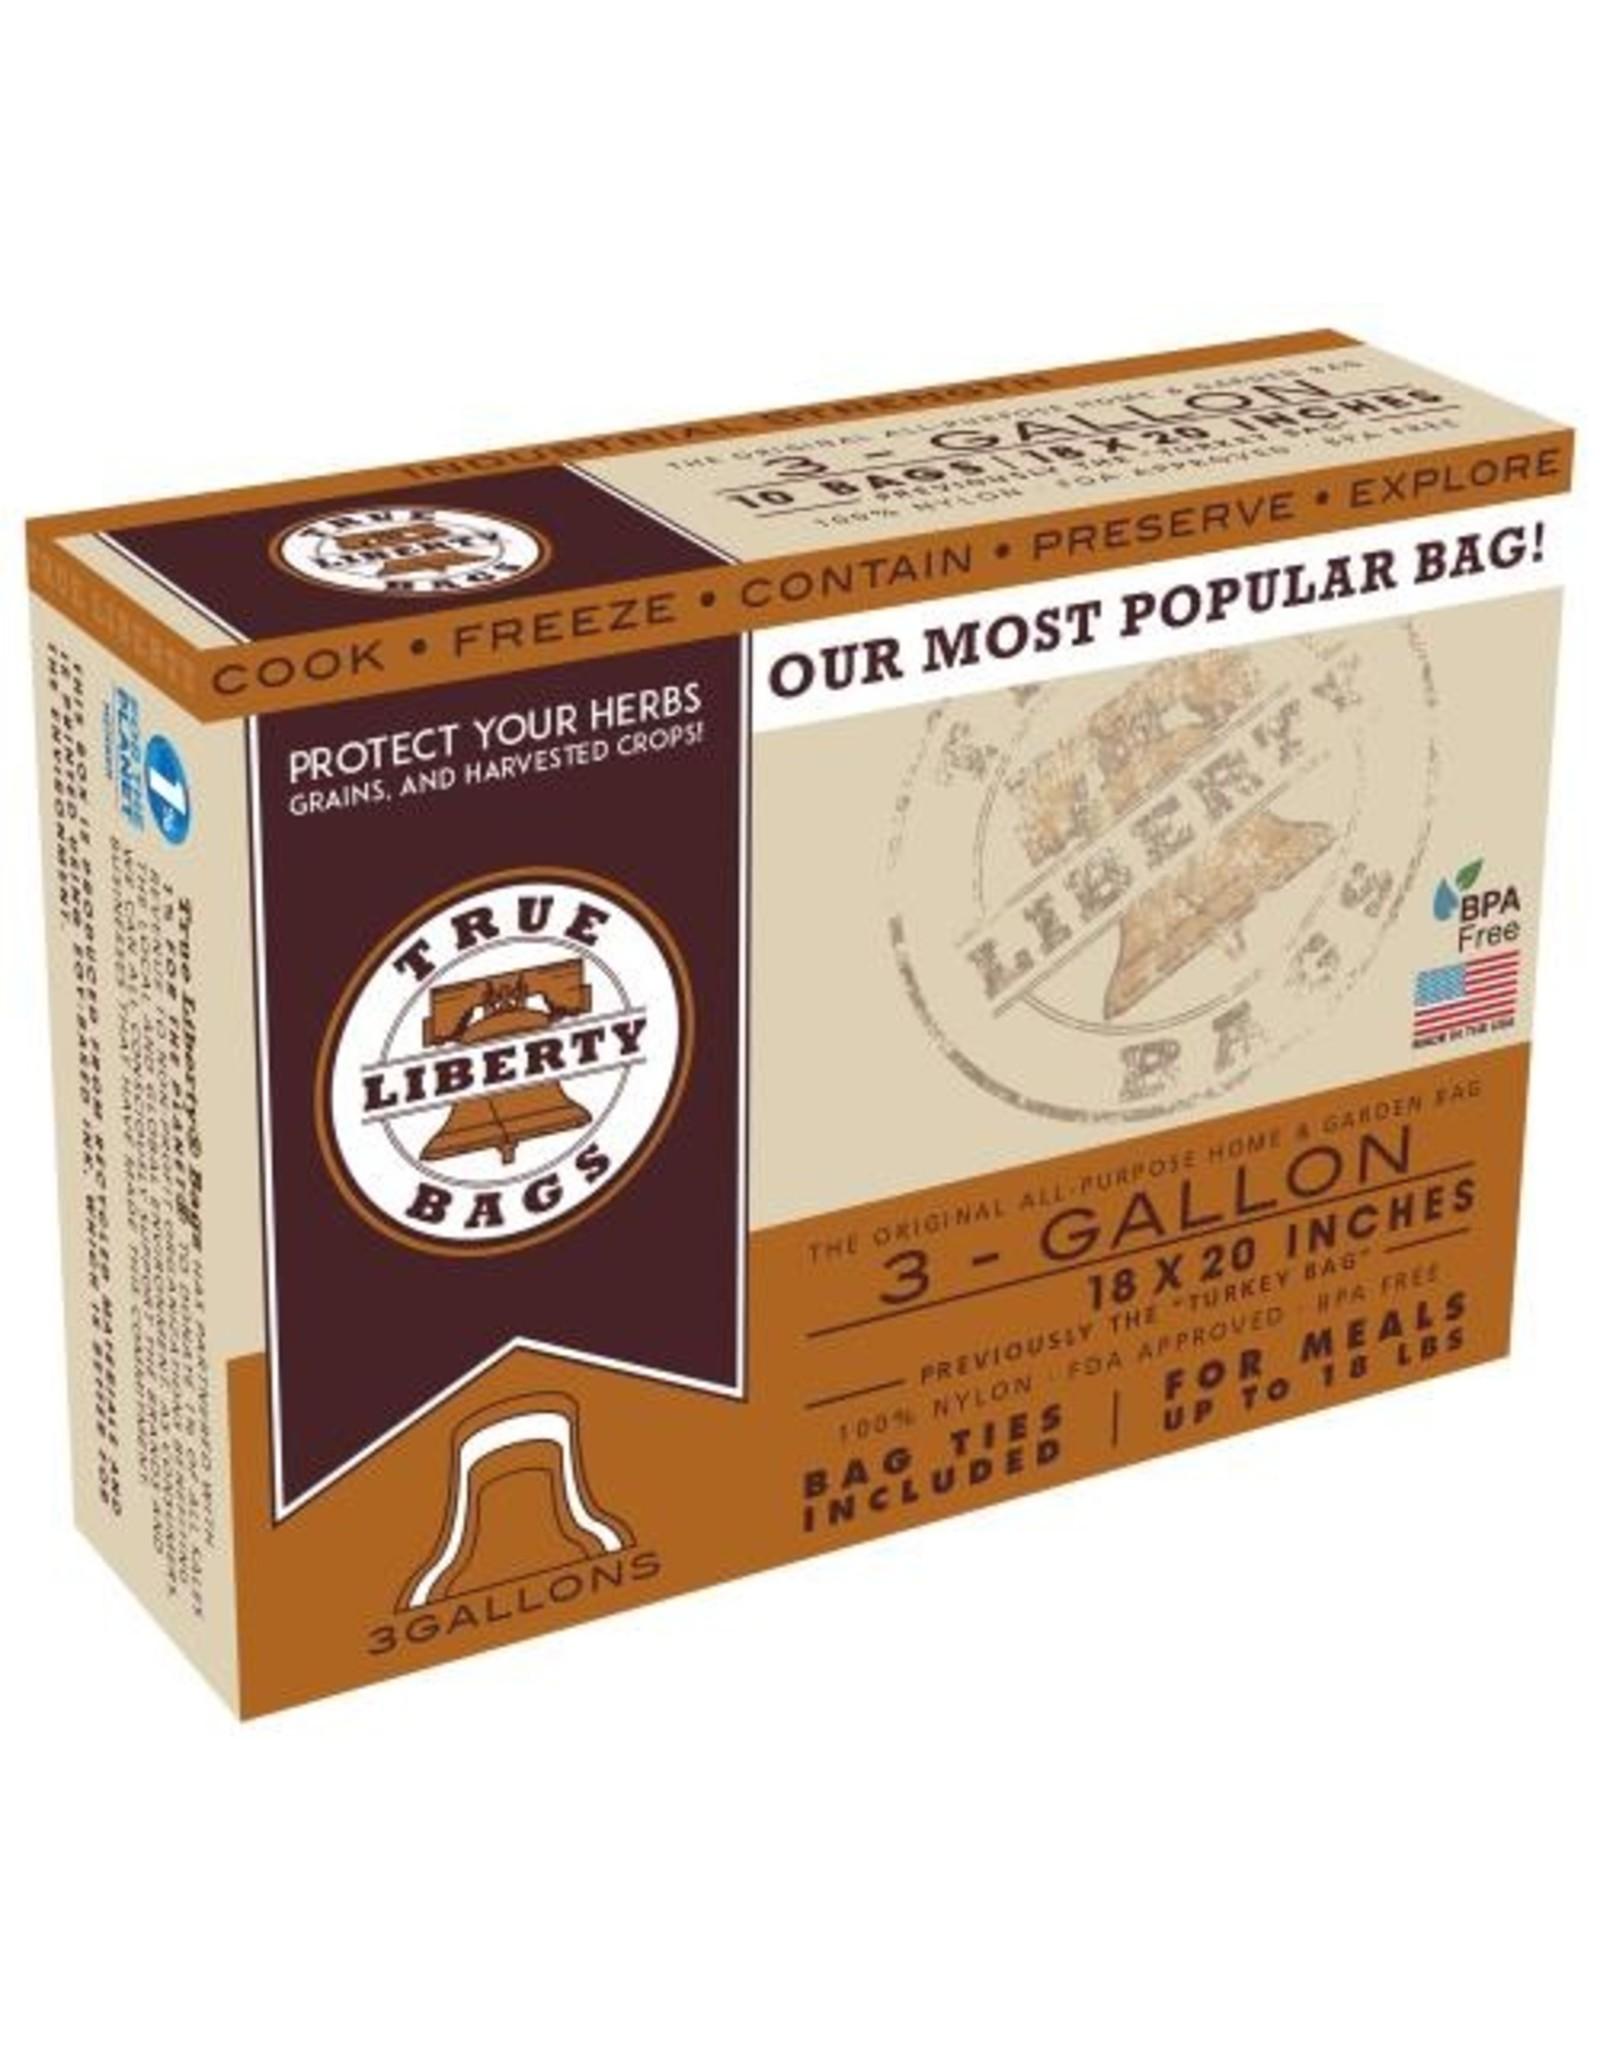 True Liberty Bags True Liberty Turkey Bags 18 in x 20 in (25/Pack)